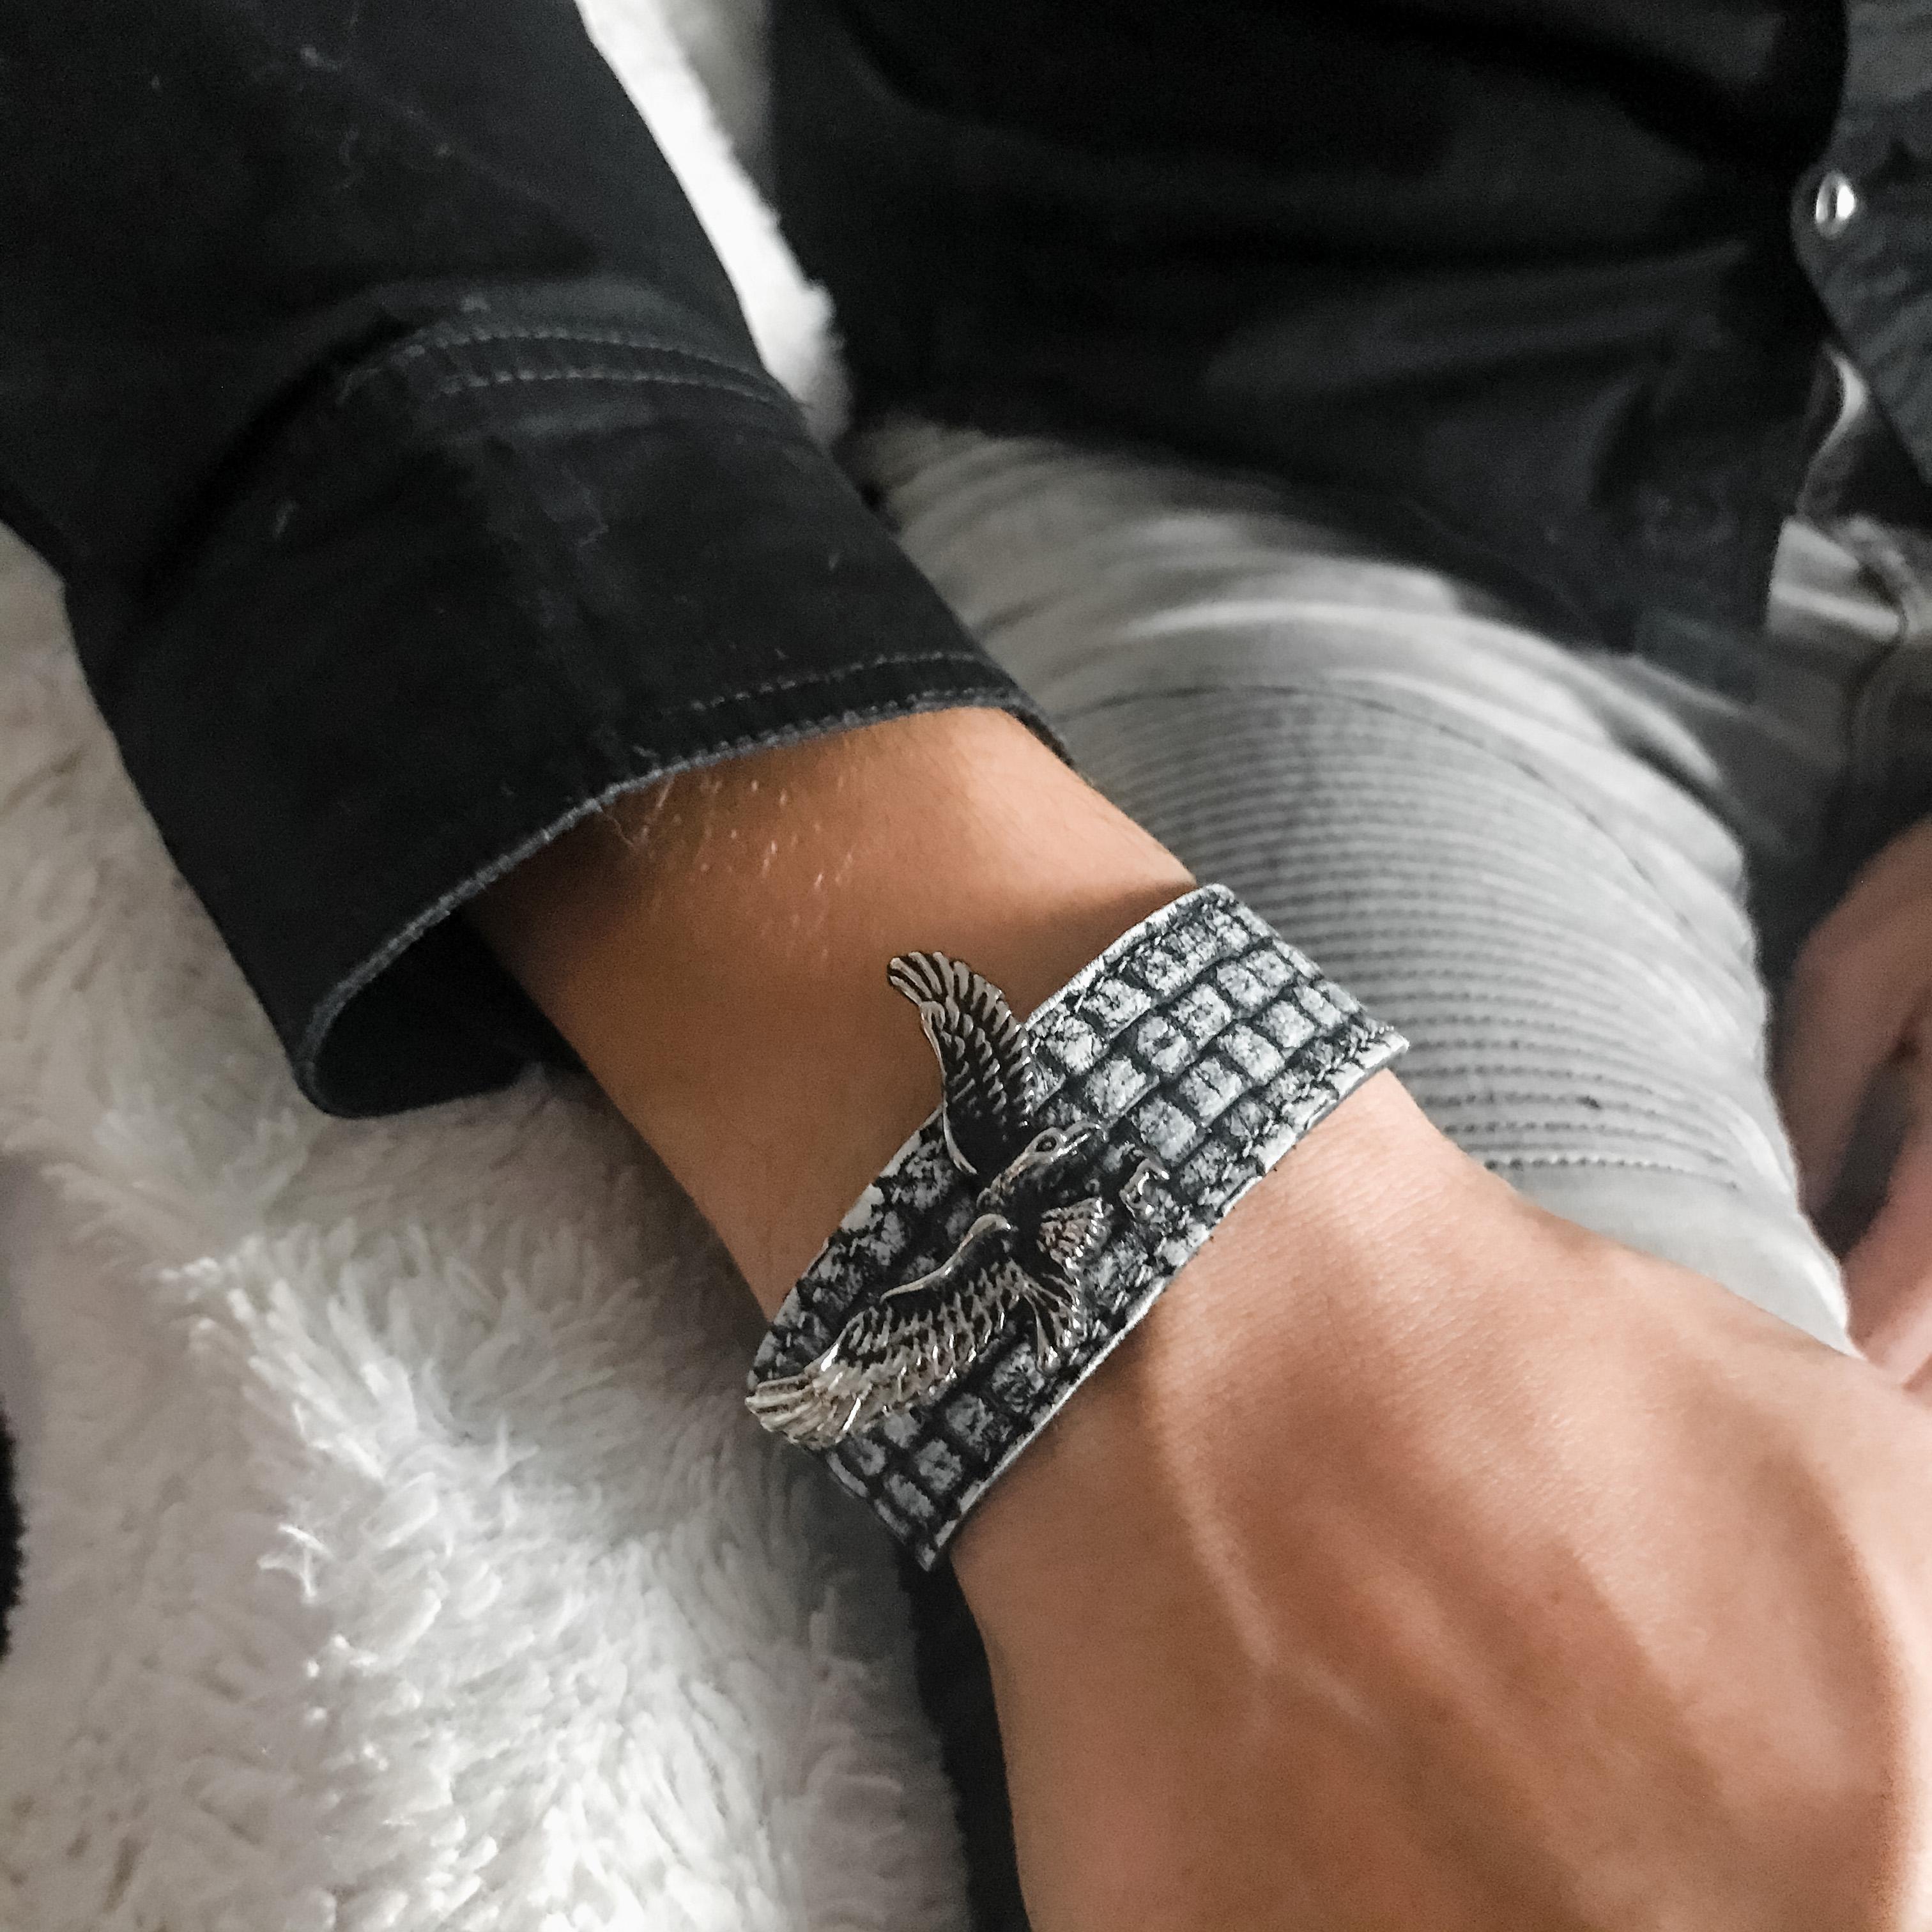 Stage Eagle Unisex leather bracelet EvilEve